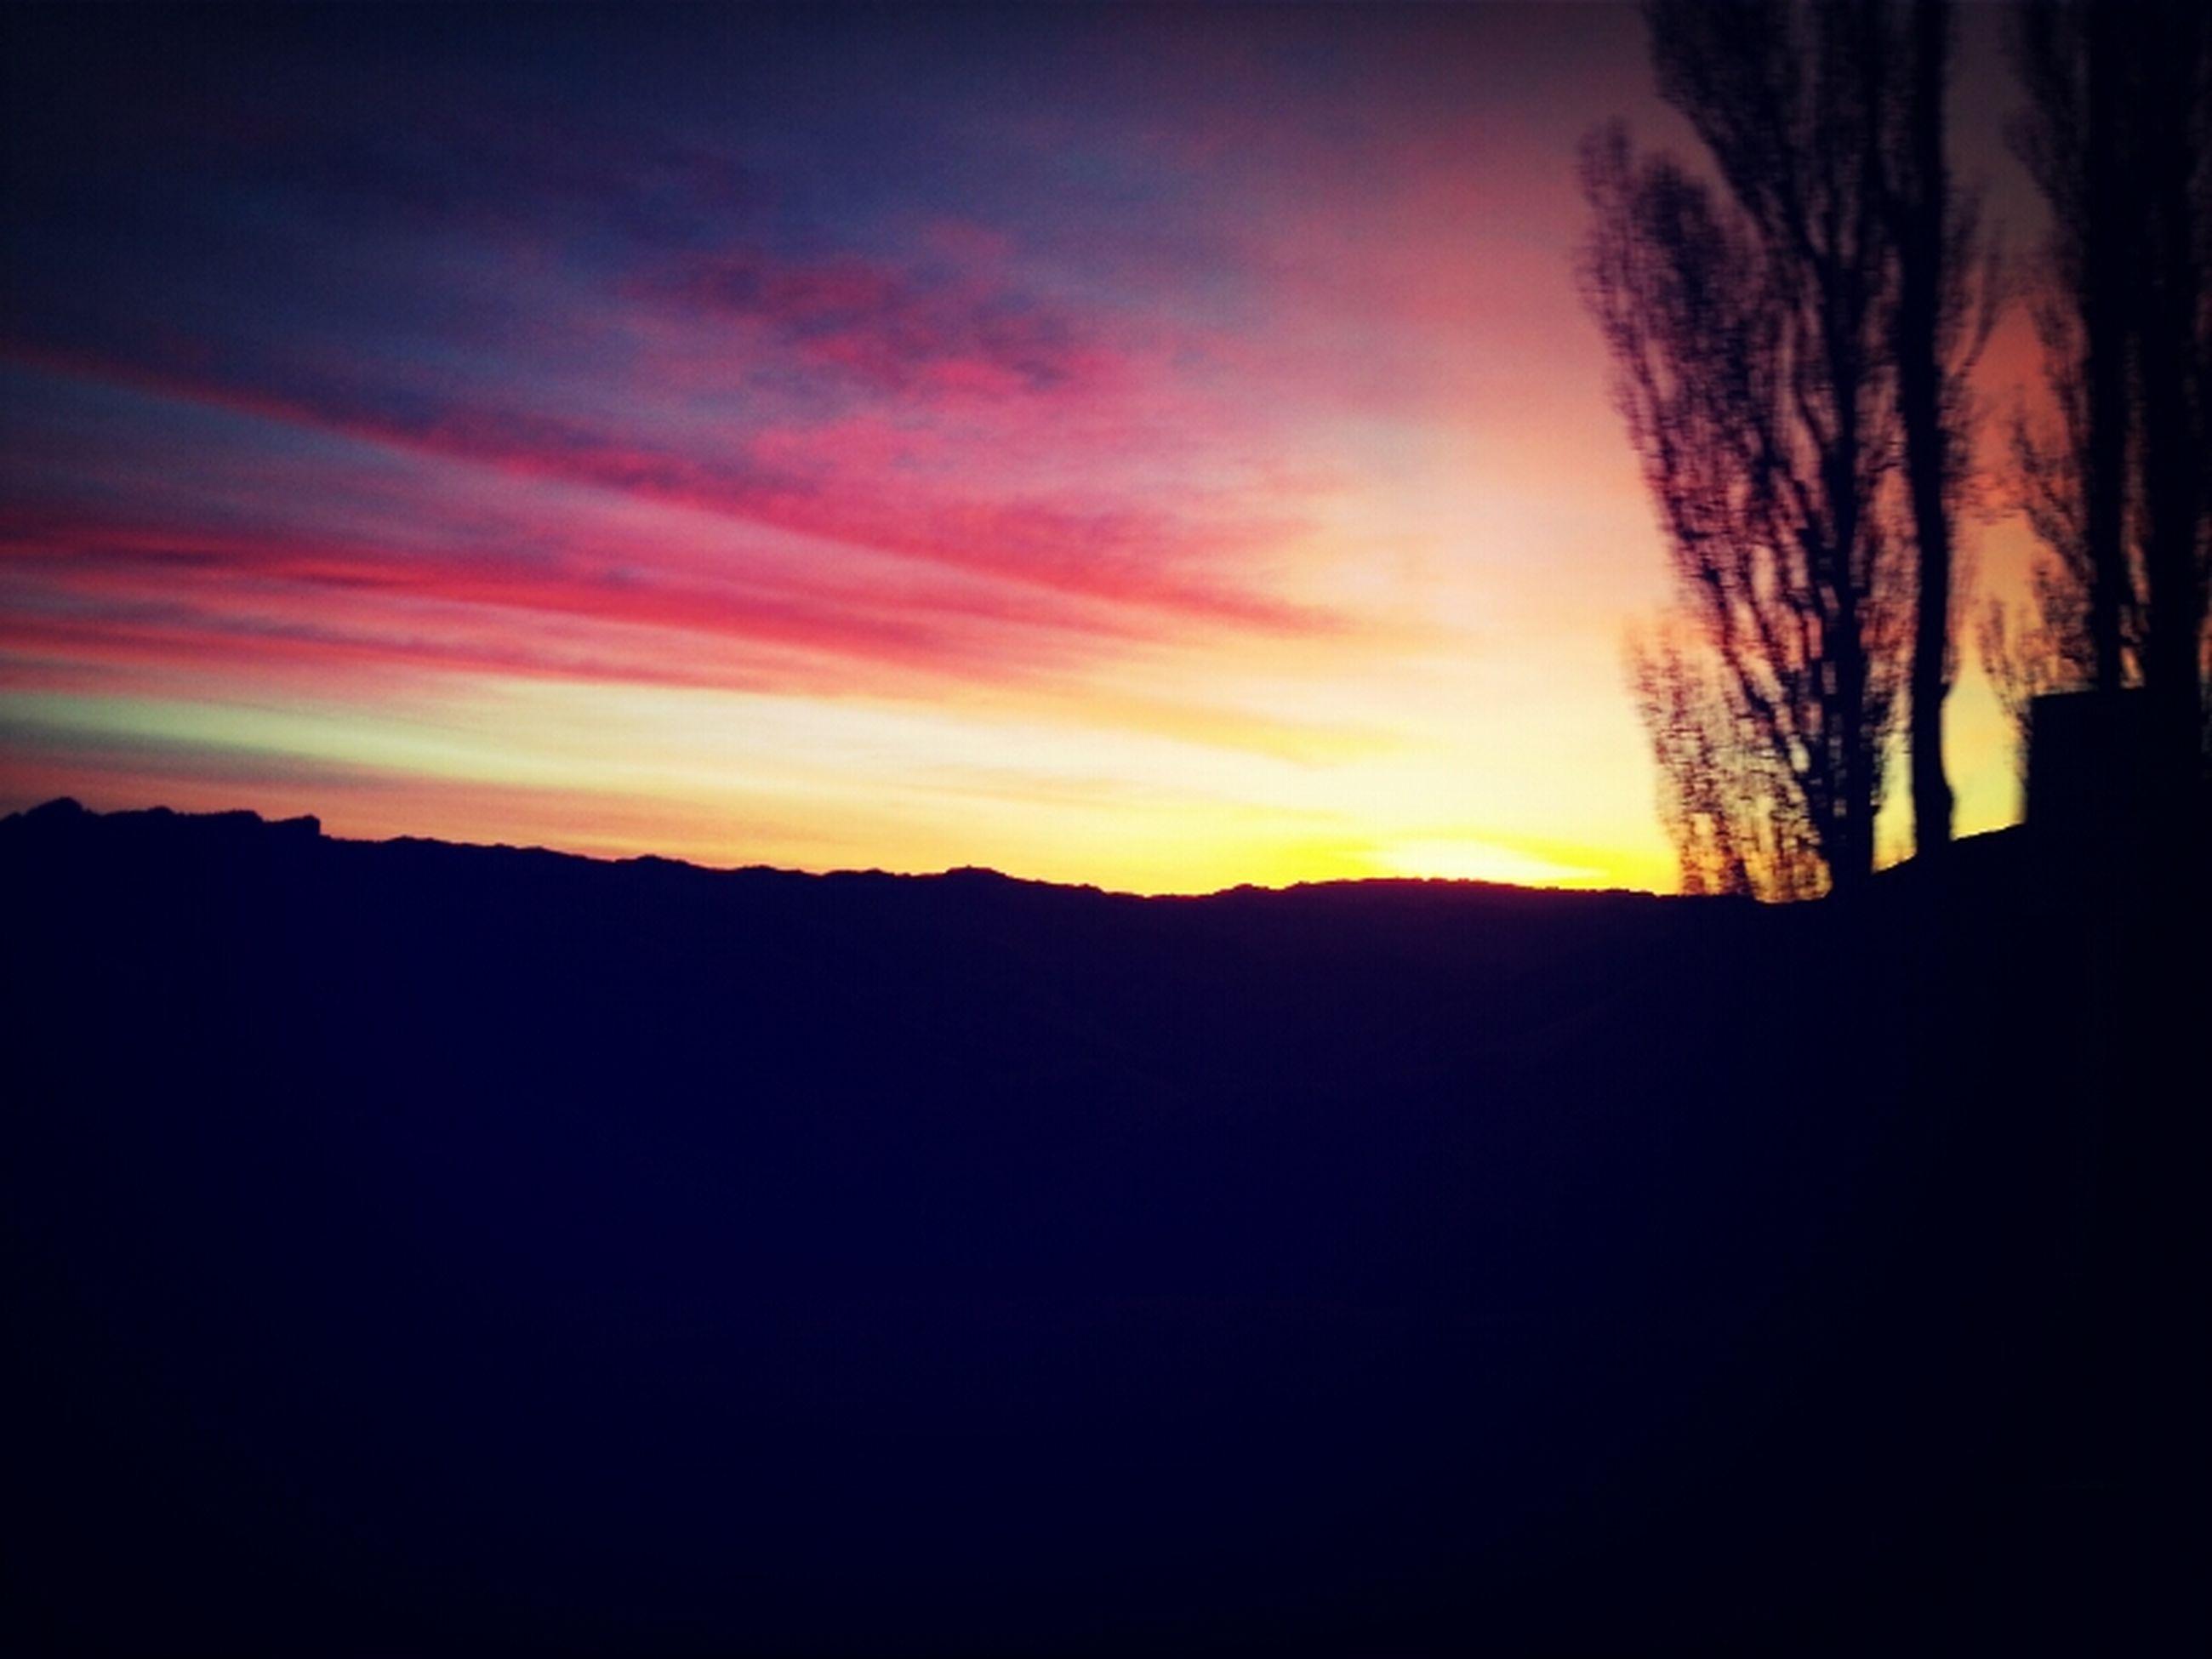 silhouette, sunset, scenics, tranquil scene, tranquility, beauty in nature, sky, dark, landscape, nature, idyllic, orange color, outline, dramatic sky, dusk, copy space, tree, cloud - sky, mountain, majestic